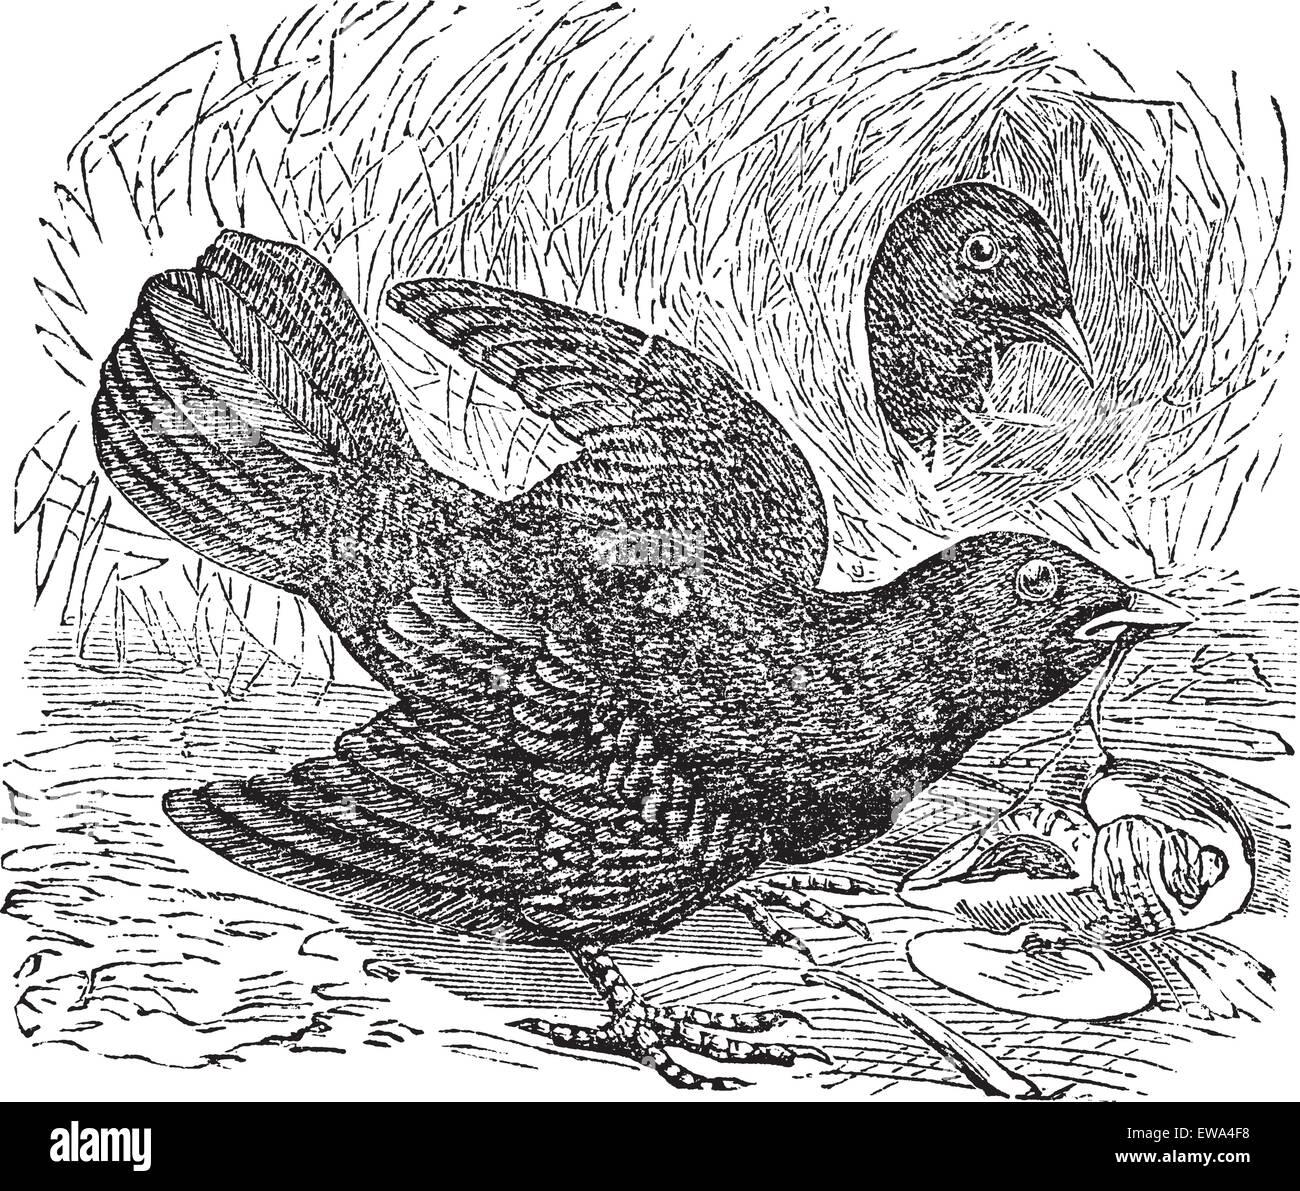 Satin Bowerbird or Ptilonorhynchus violaceus, vintage engraving. Old engraved illustration of  two Satin Bowerbird - Stock Vector